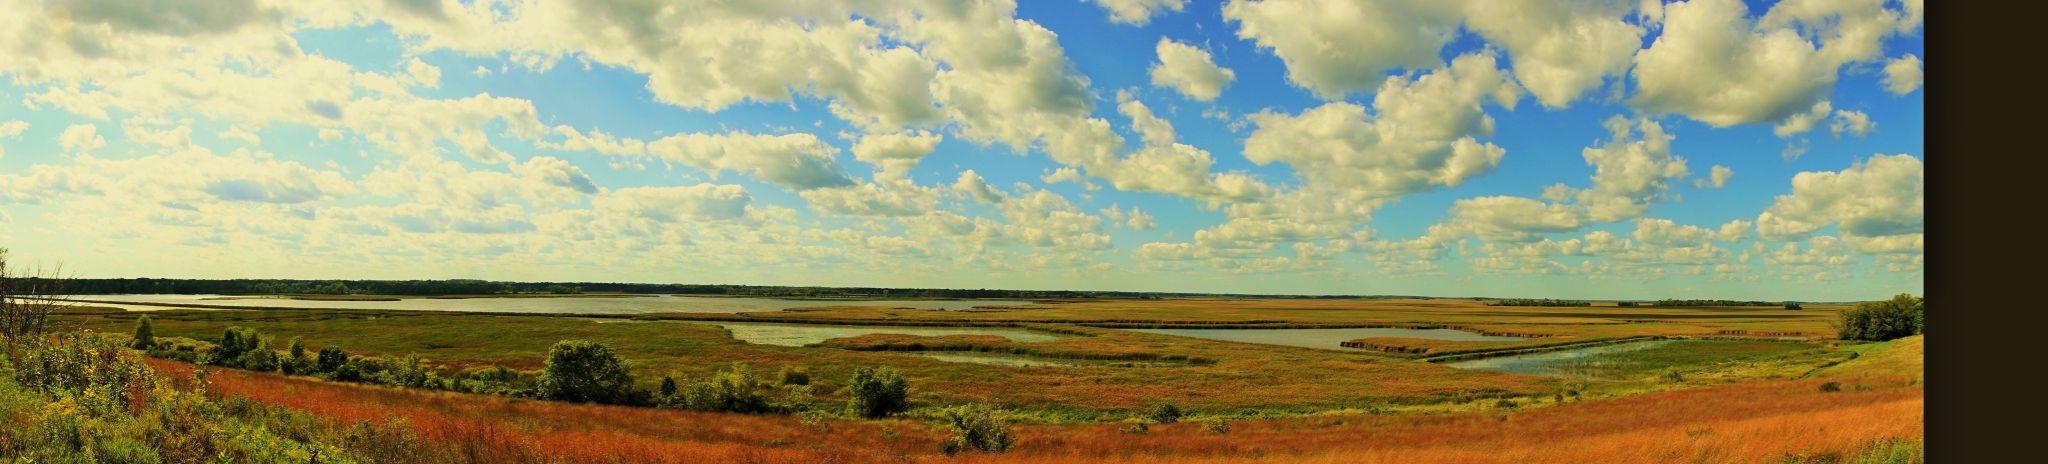 Marsh by Trisha Spettel